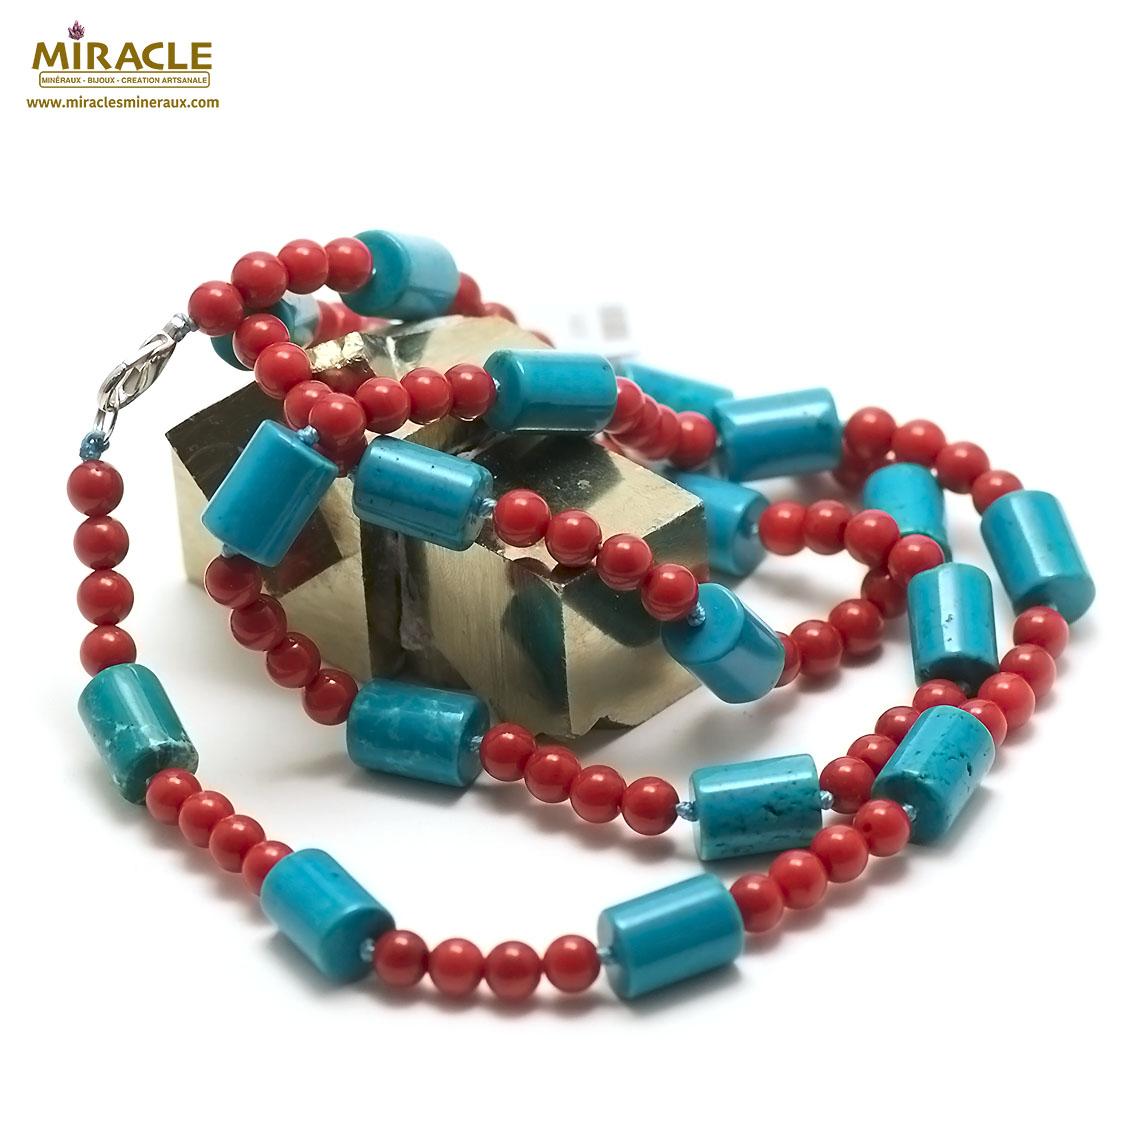 collier long turquoise et corail tube et perle ronde 7 mm